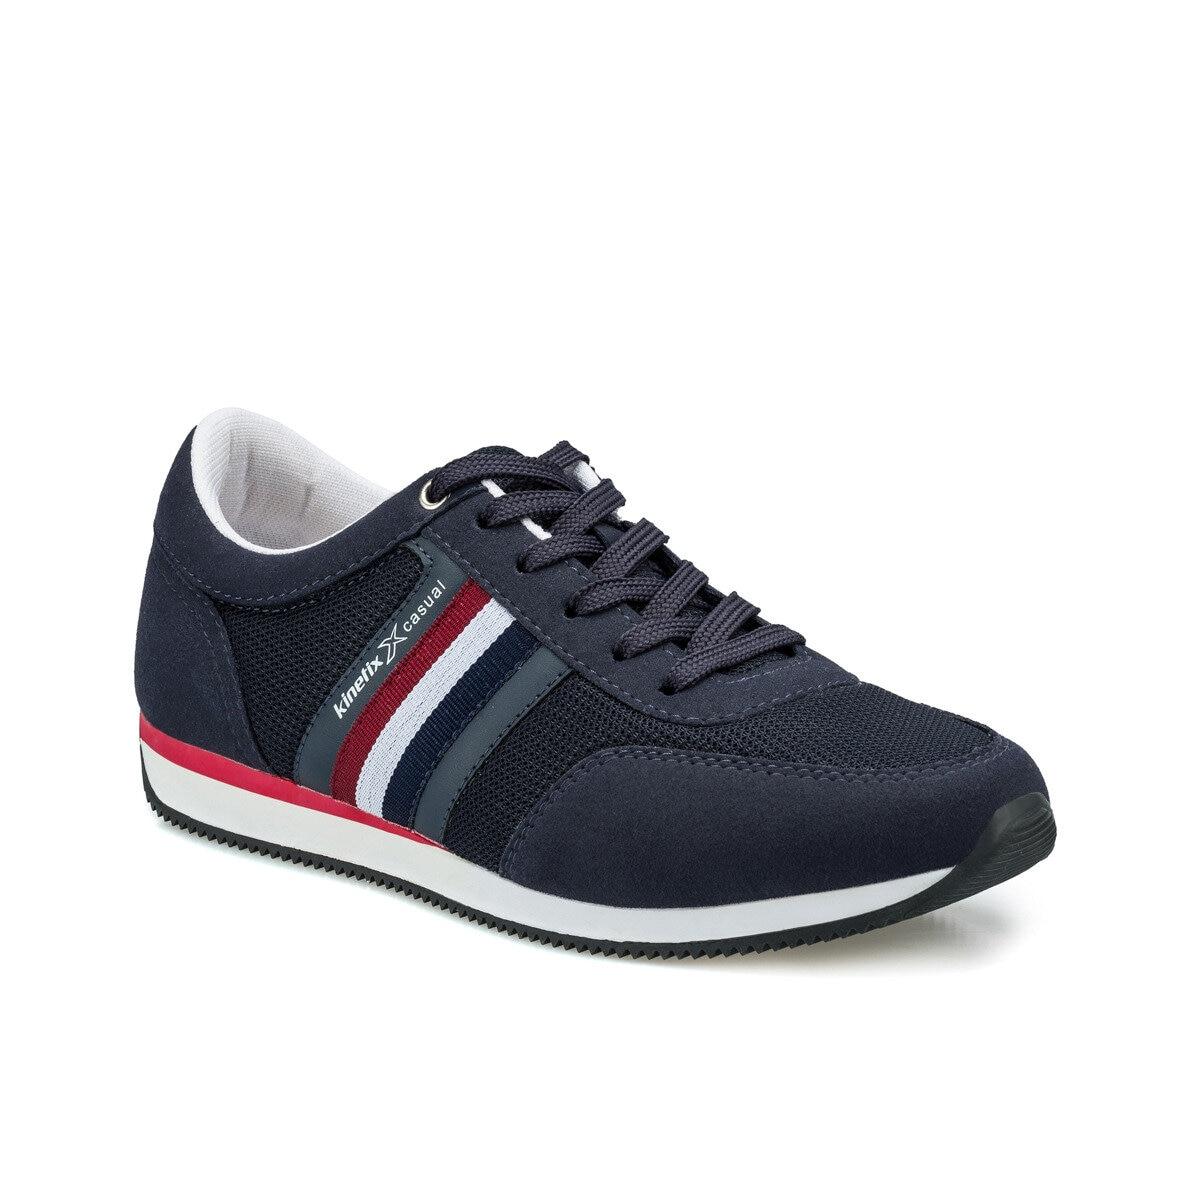 FLO JUSTIN Light Gray Men 'S Sneaker Shoes KINETIX